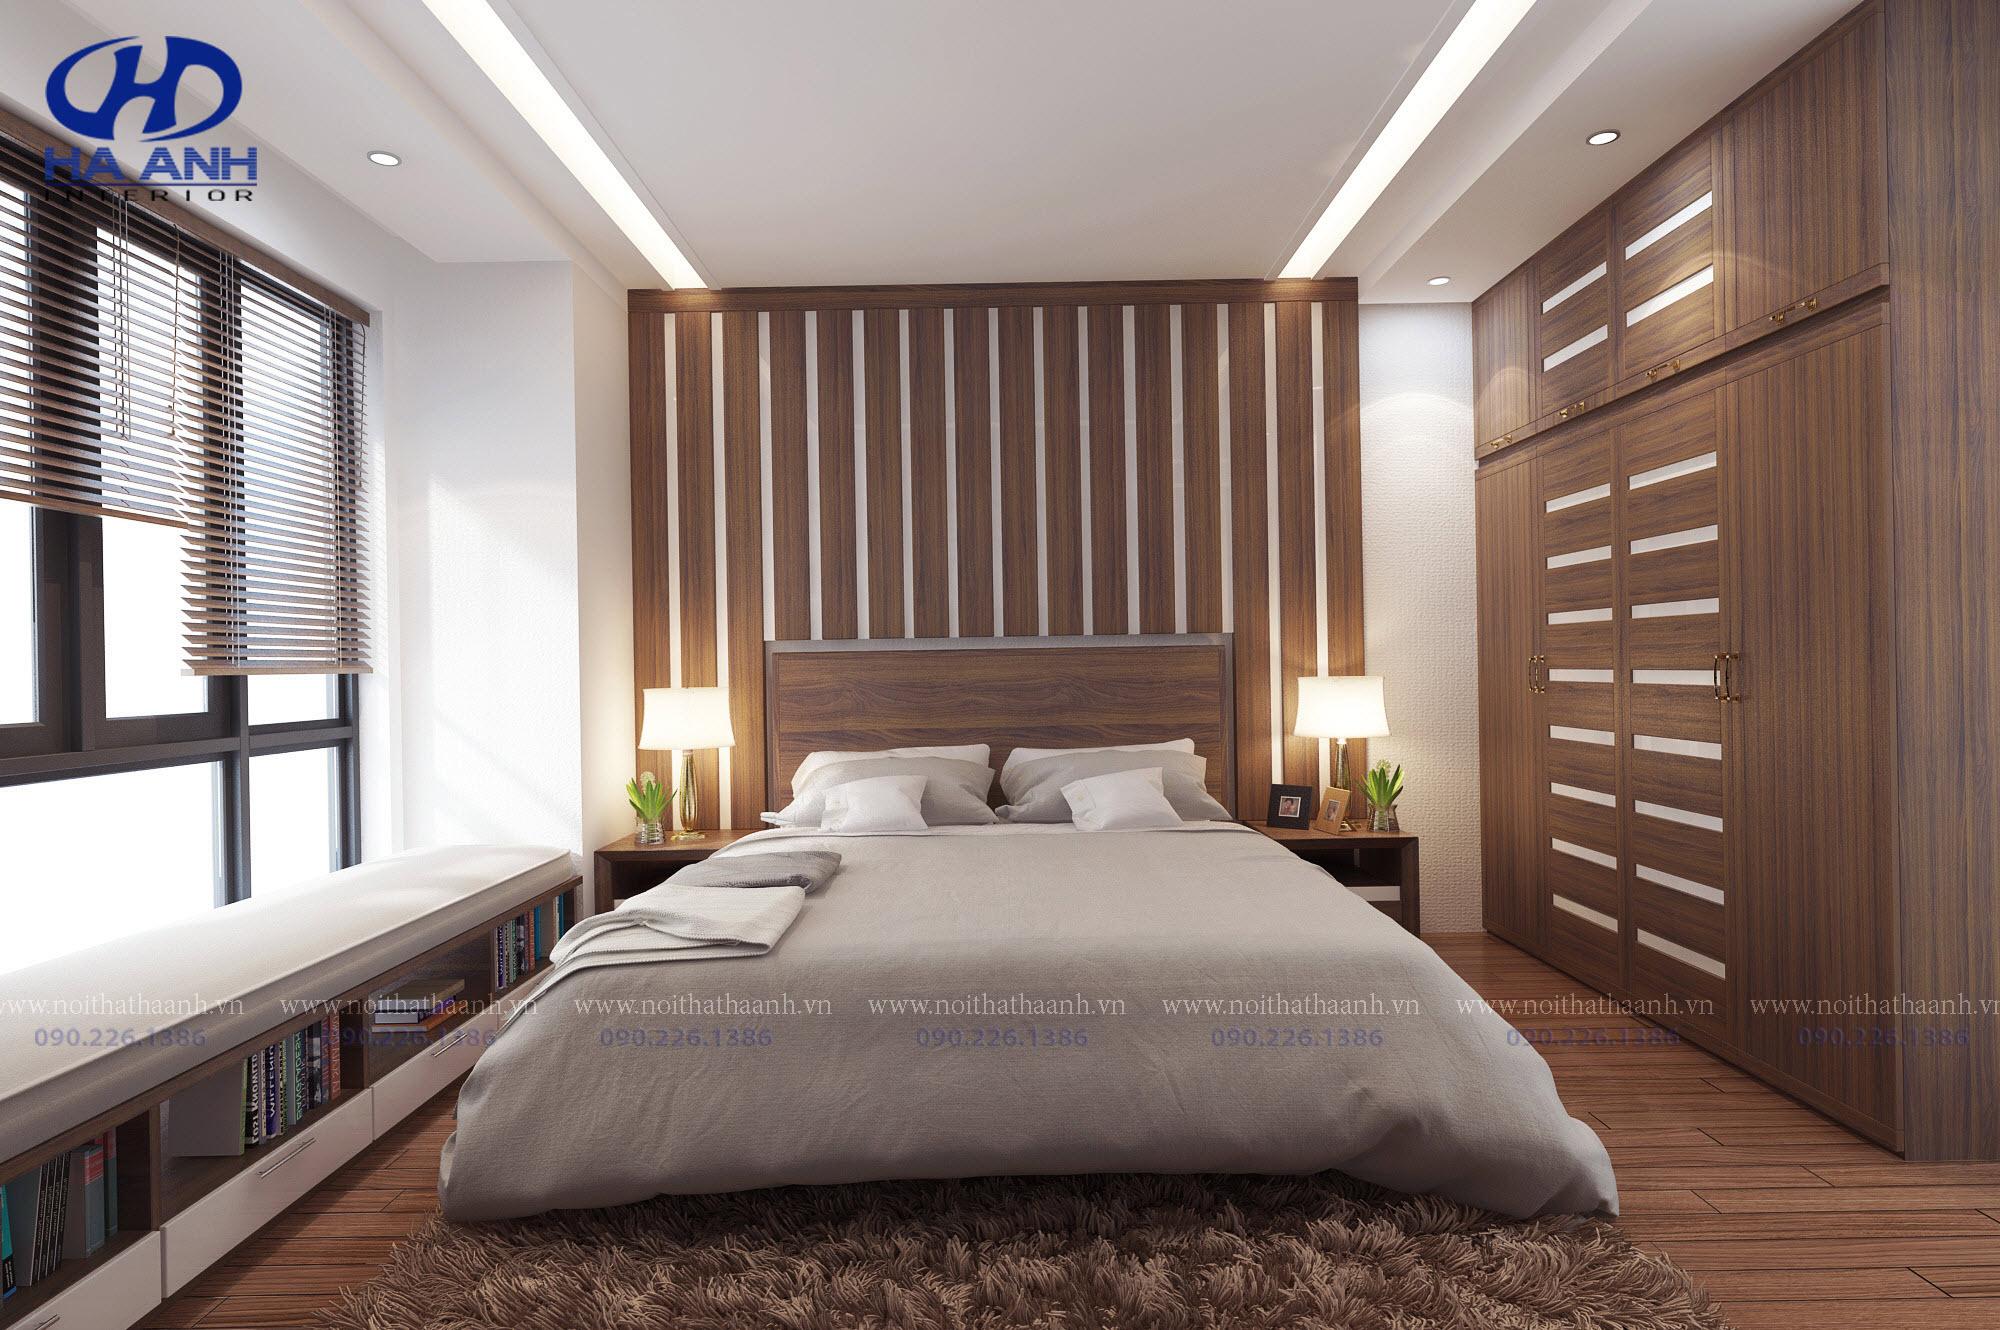 Phòng ngủ laminate HA-8020-1